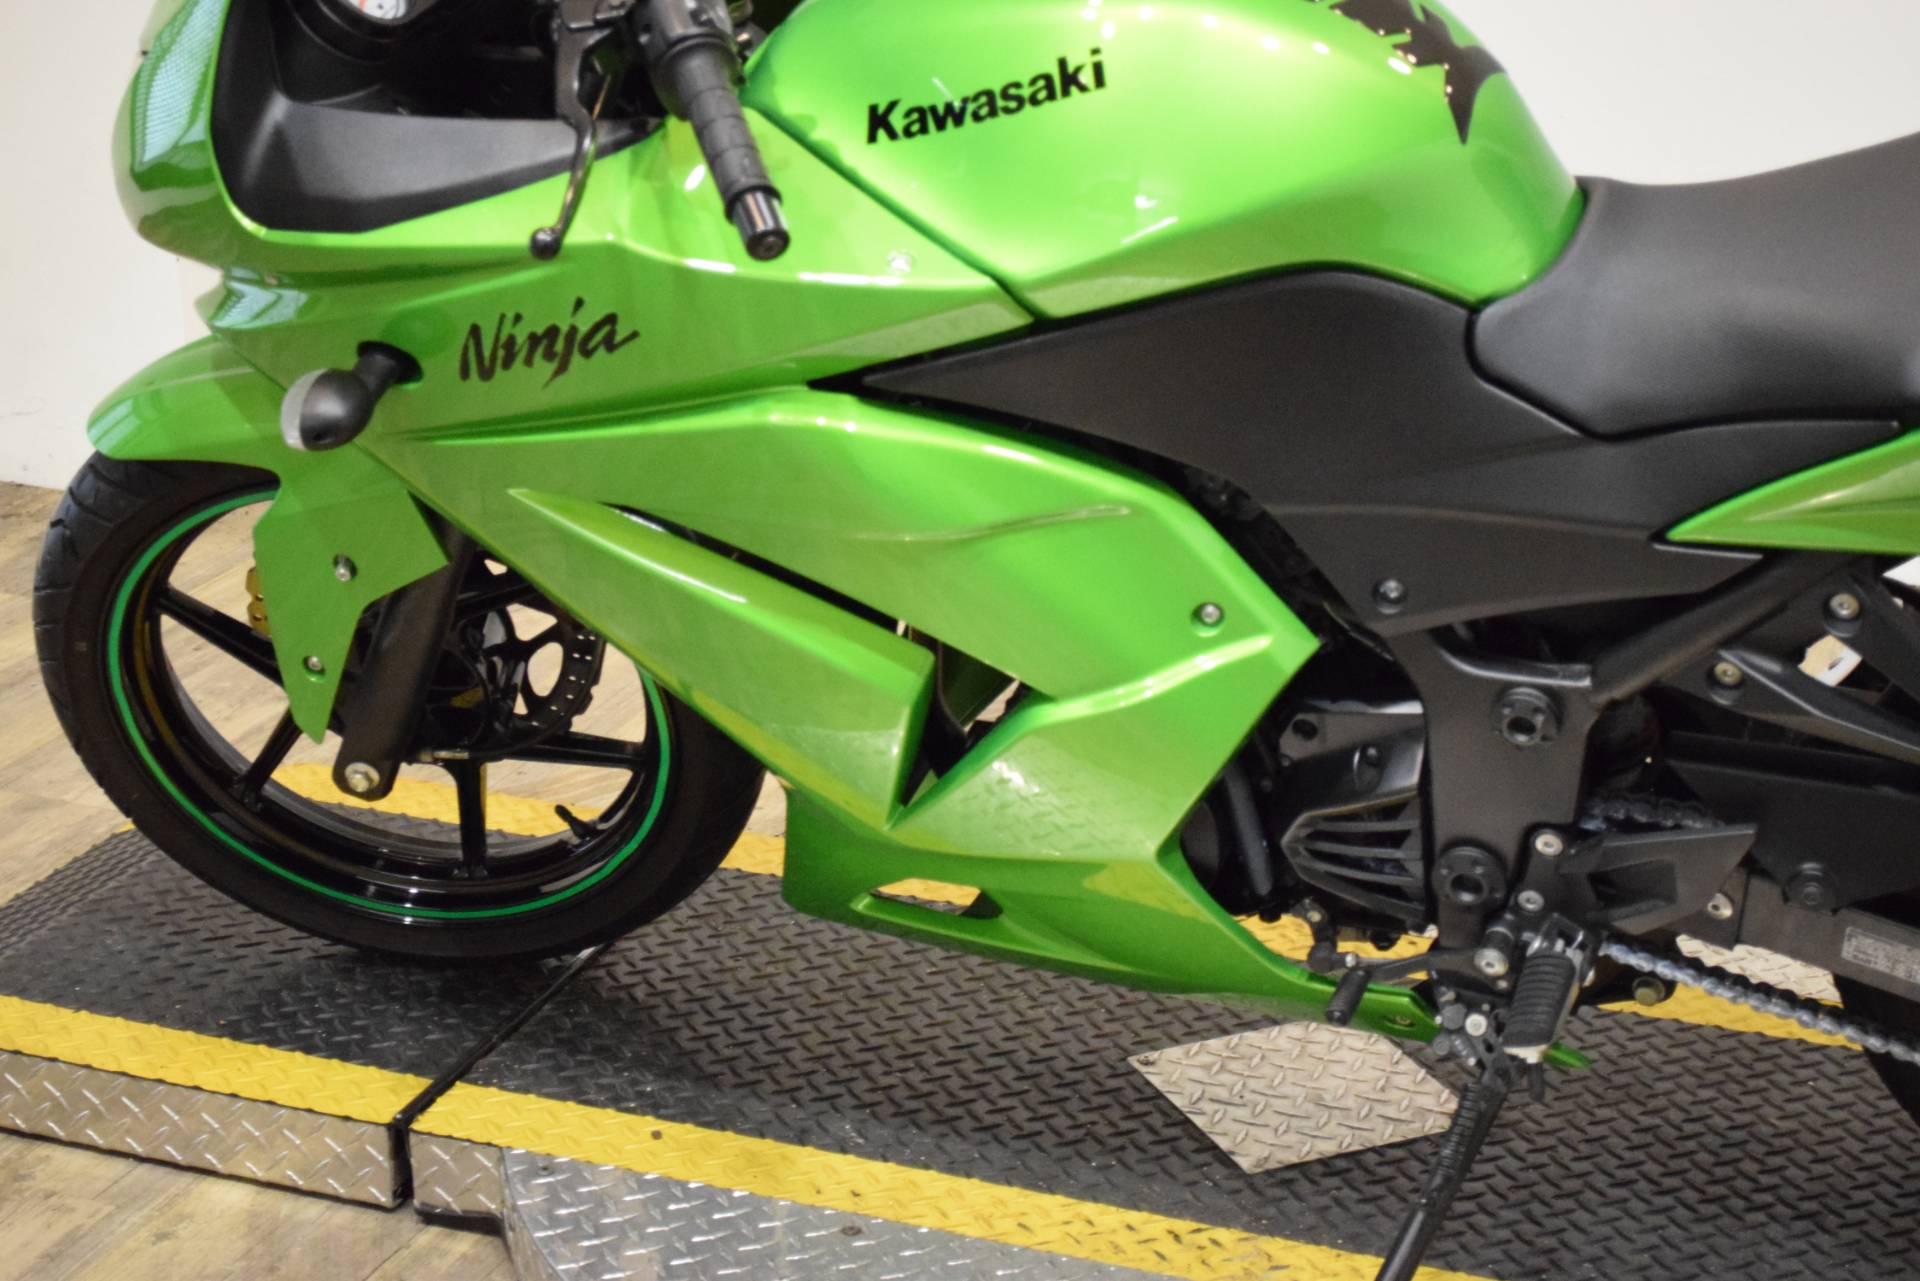 2012 Kawasaki Ninja 250r In Wauconda Illinois